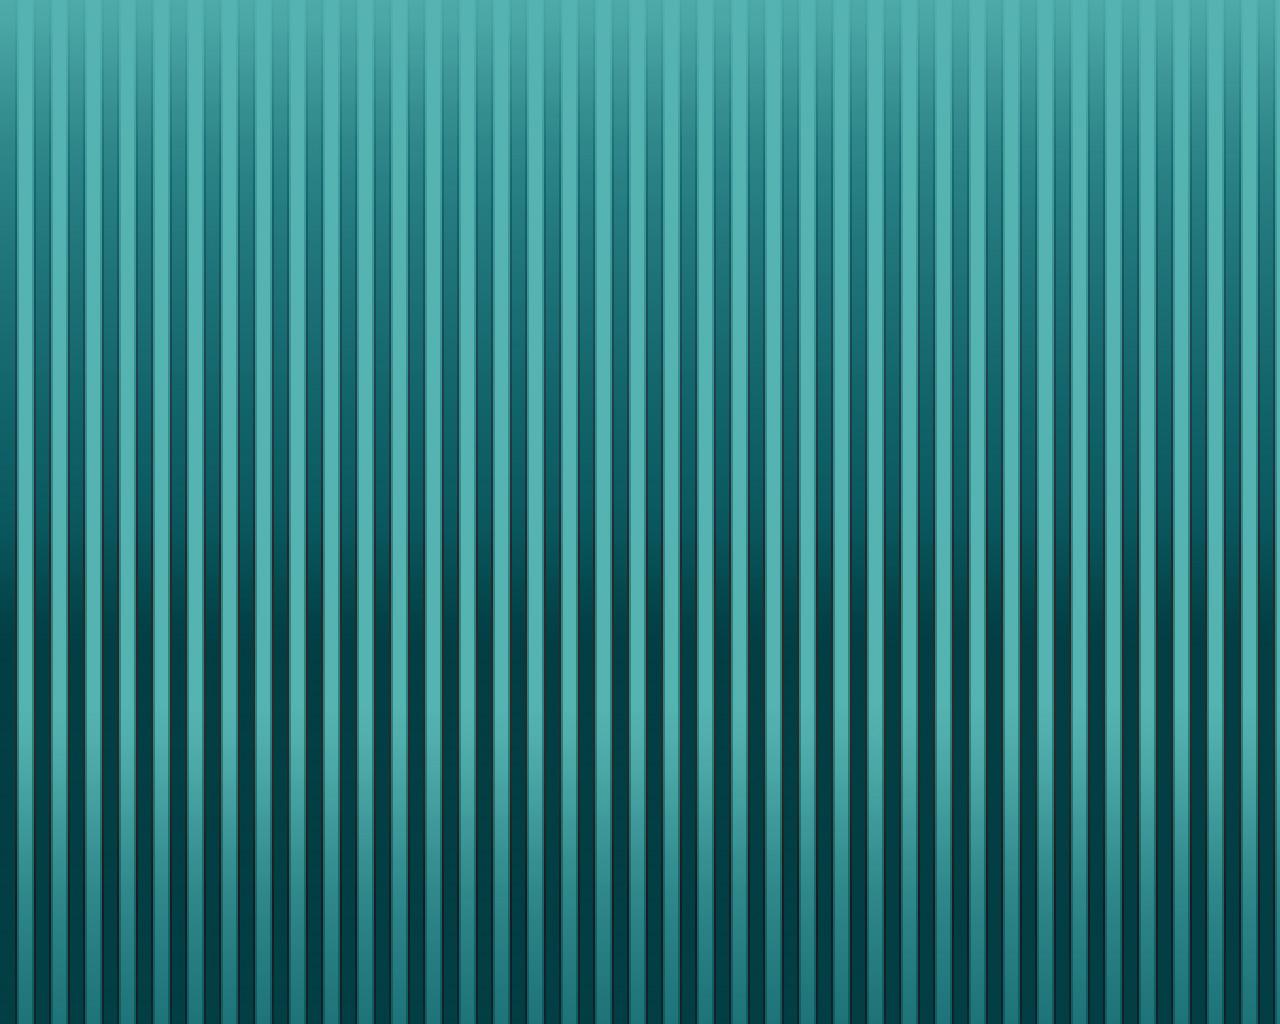 Wallpaper Stripes Design : Stripe bing images